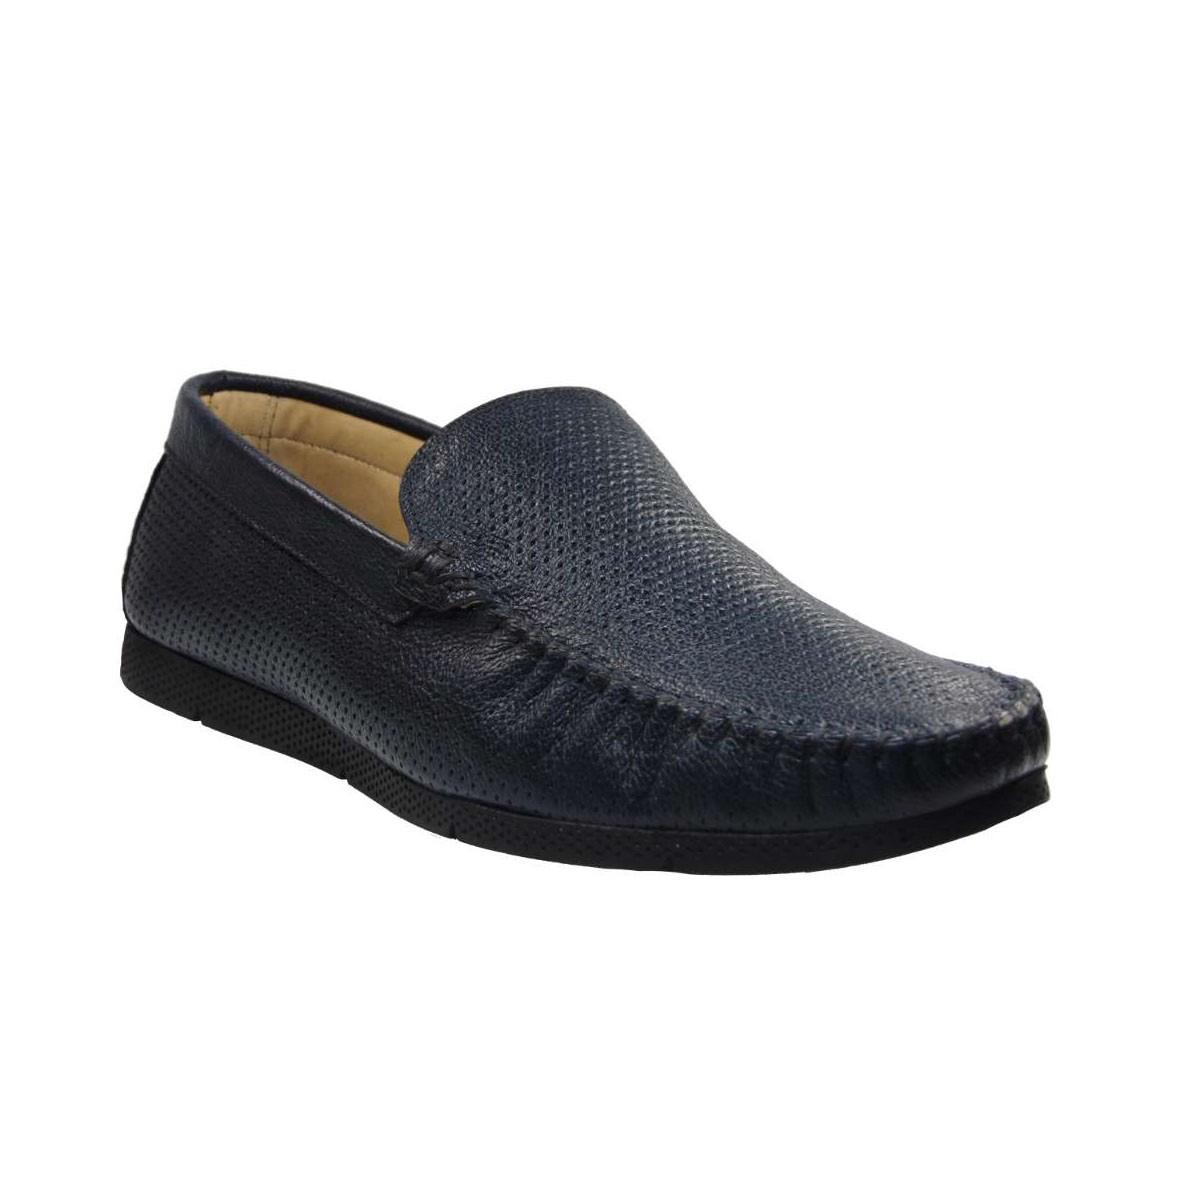 Tsimpolis Shoes R147 Ανδρικό Μοκασίνι Απο Γνήσιο Δέρμα Μπλε